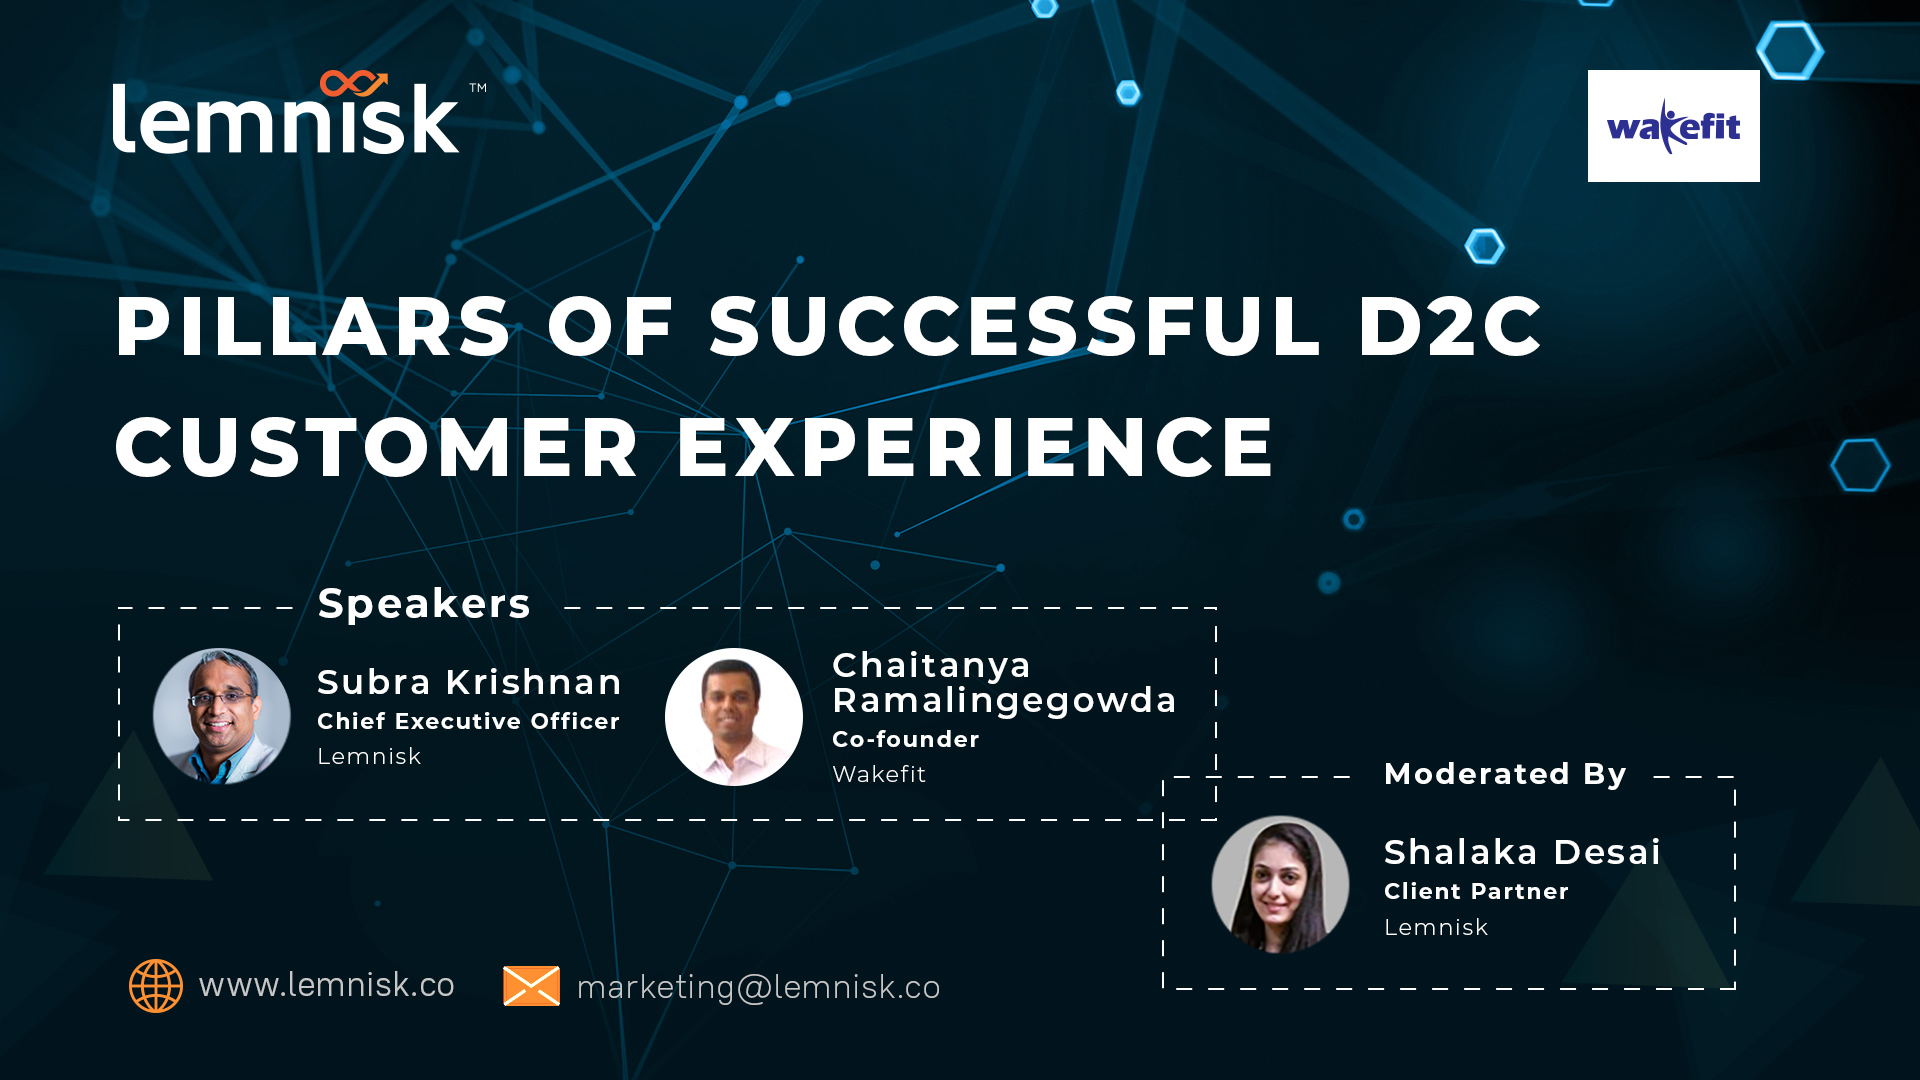 Pillars of Successful D2C Customer Experience